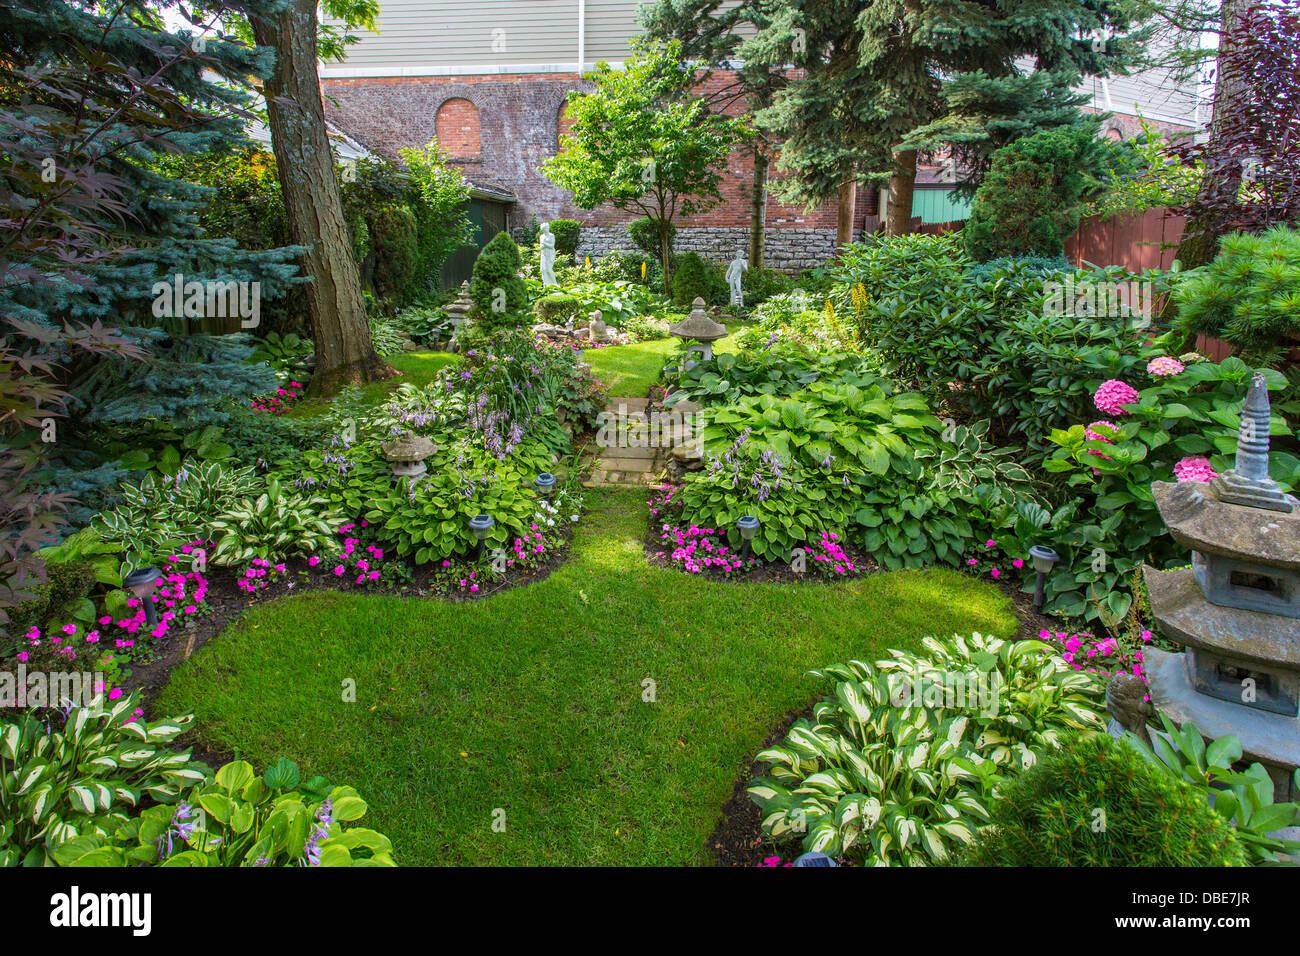 Garden Walk Buffalo Cottage District 5: Gardens In Cottage District Part Of GardenWalk Buffalo NY